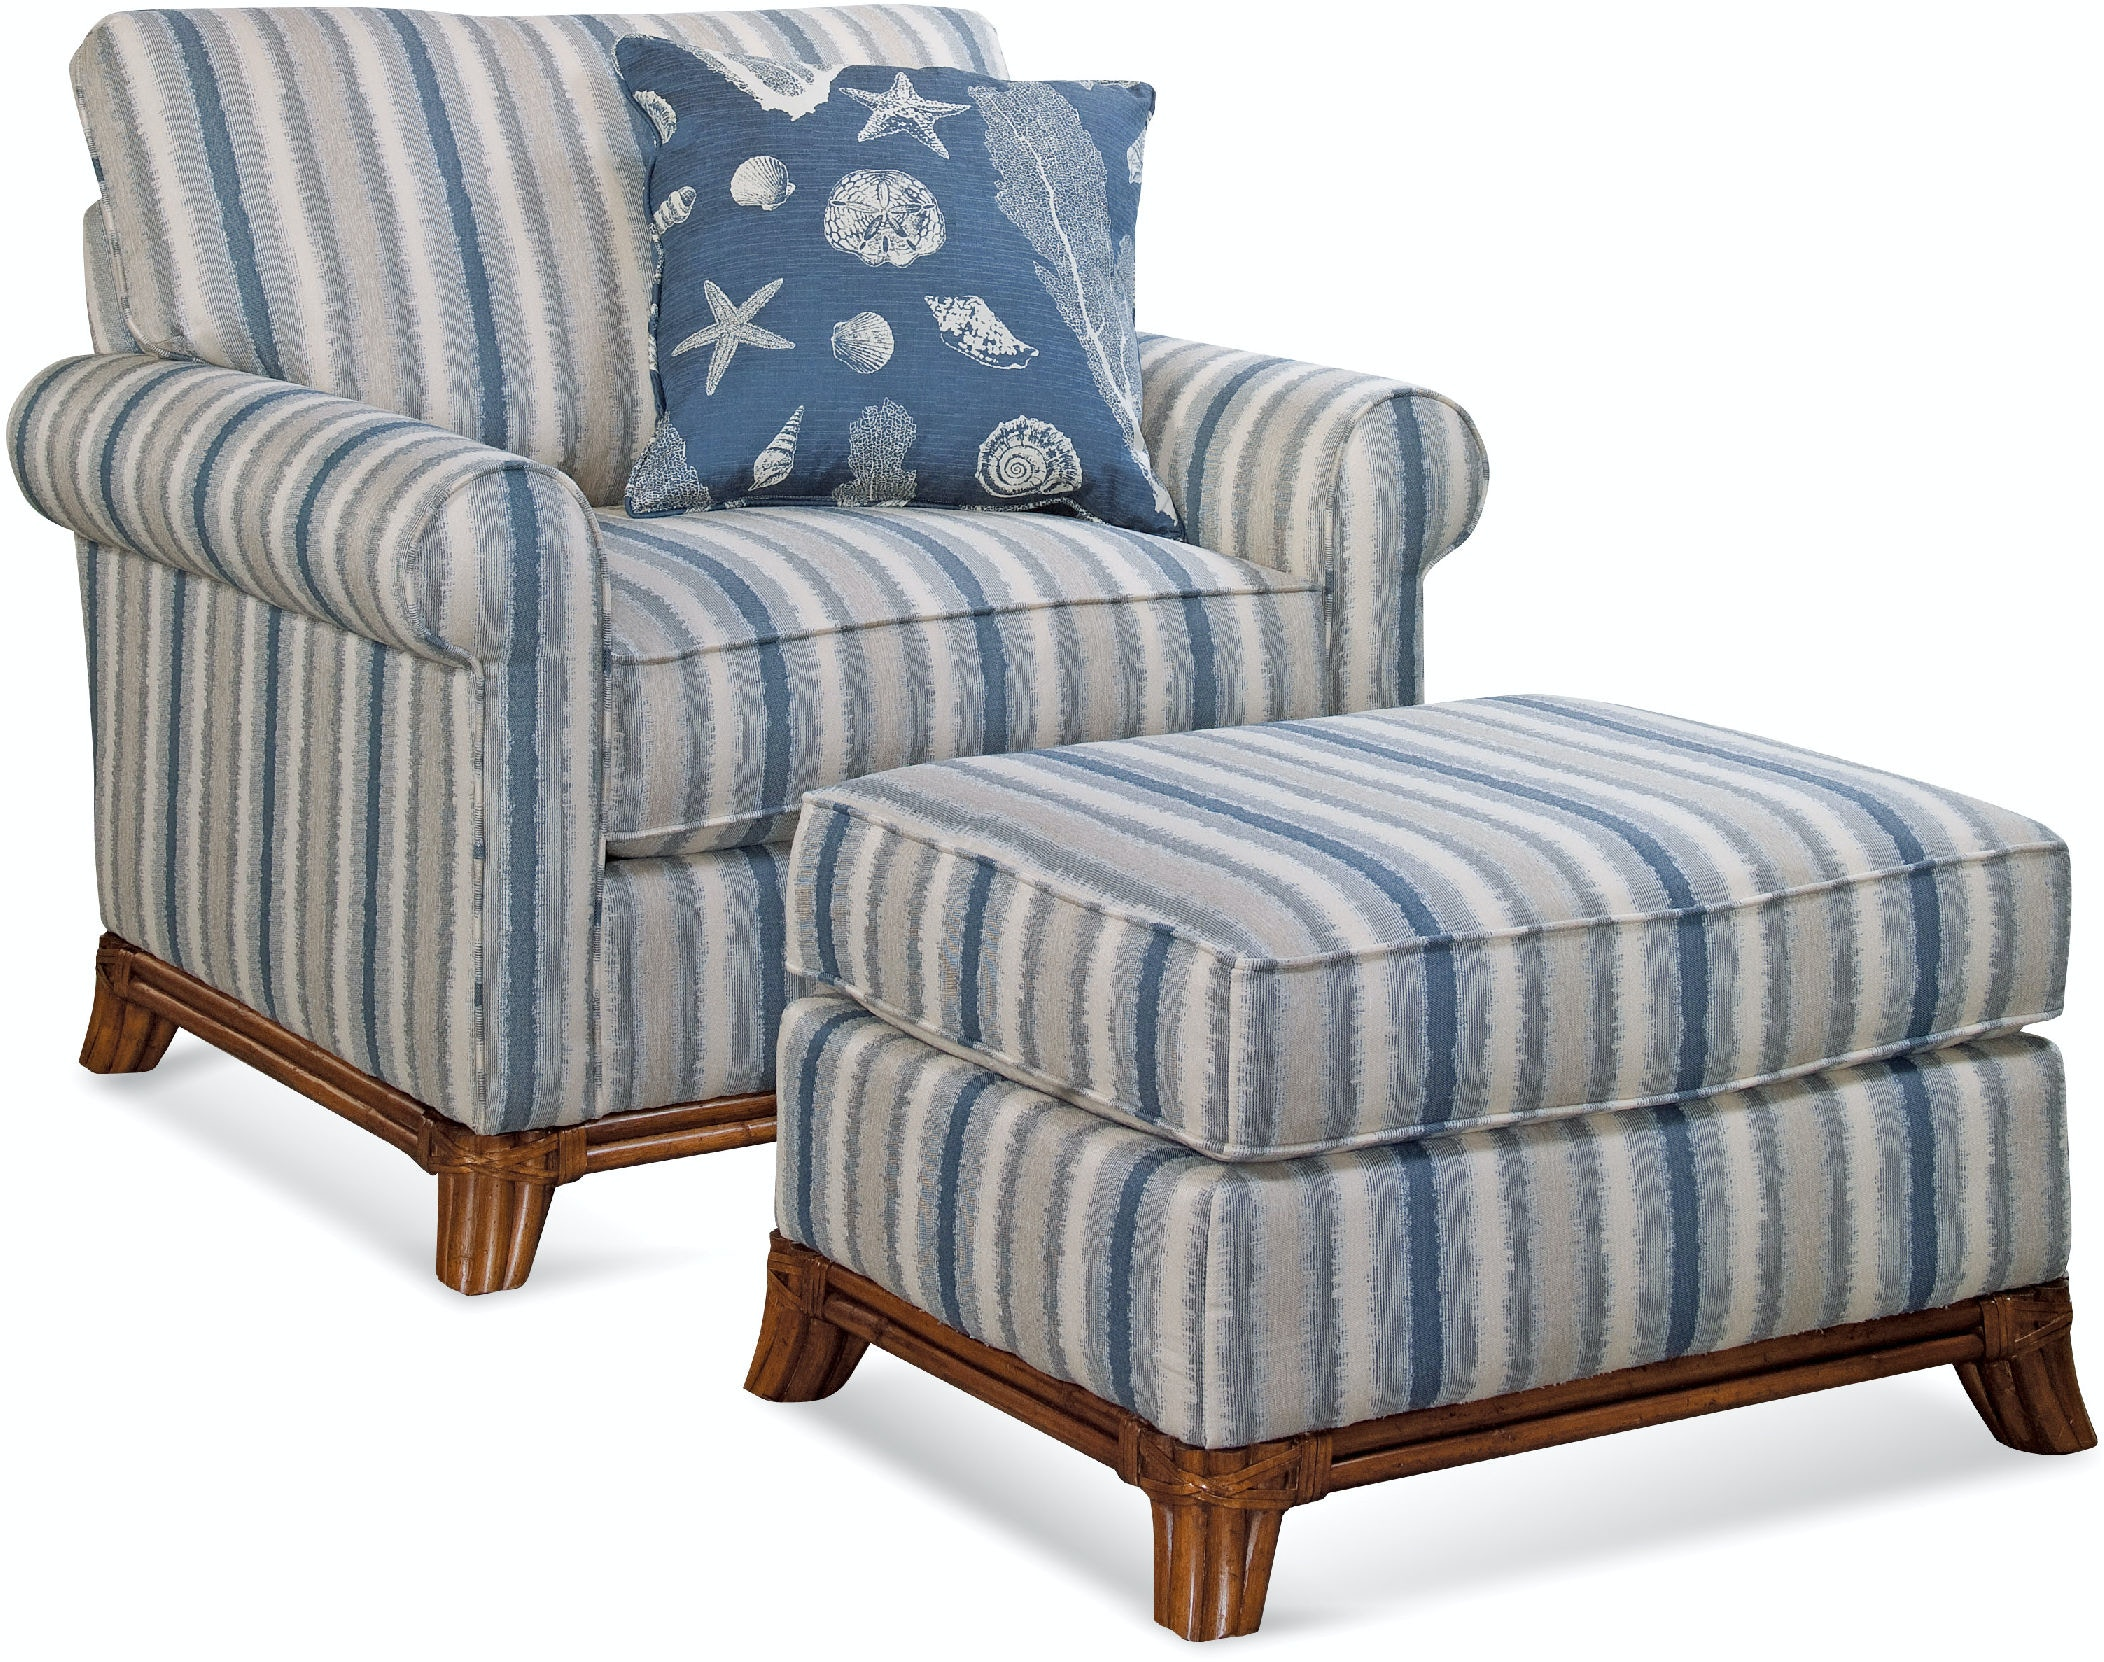 Braxton Culler Living Room Chair 1077 001 Kalin Home